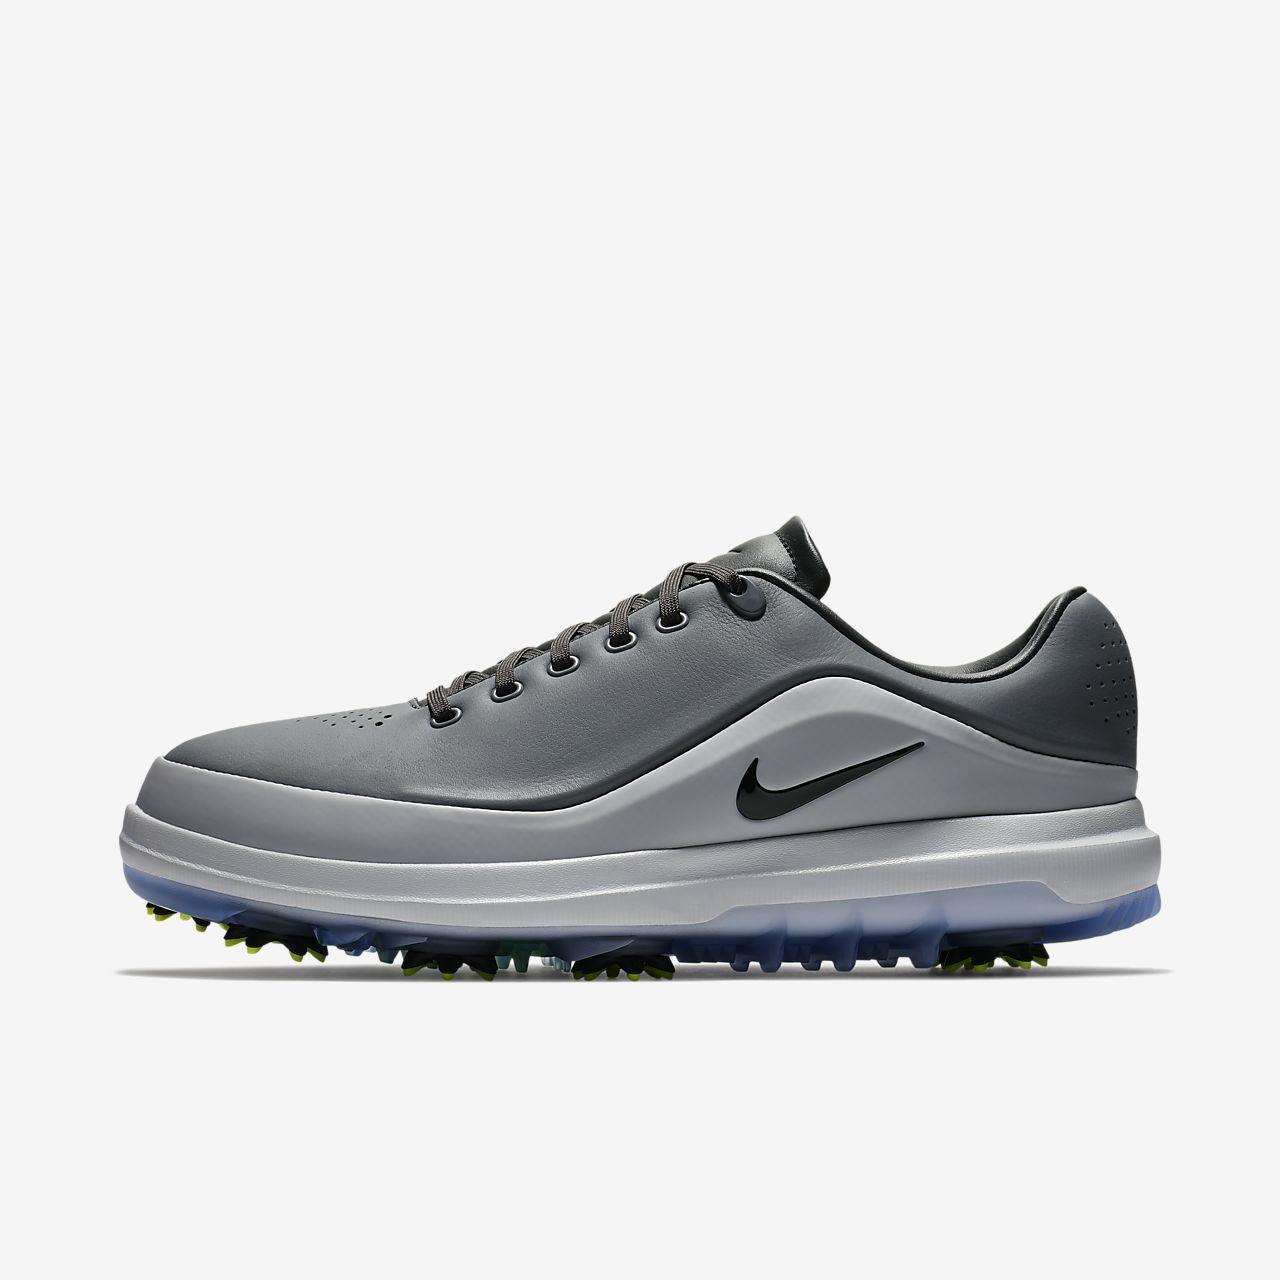 best website 54c40 1d2d2 Nike Air Zoom Precision